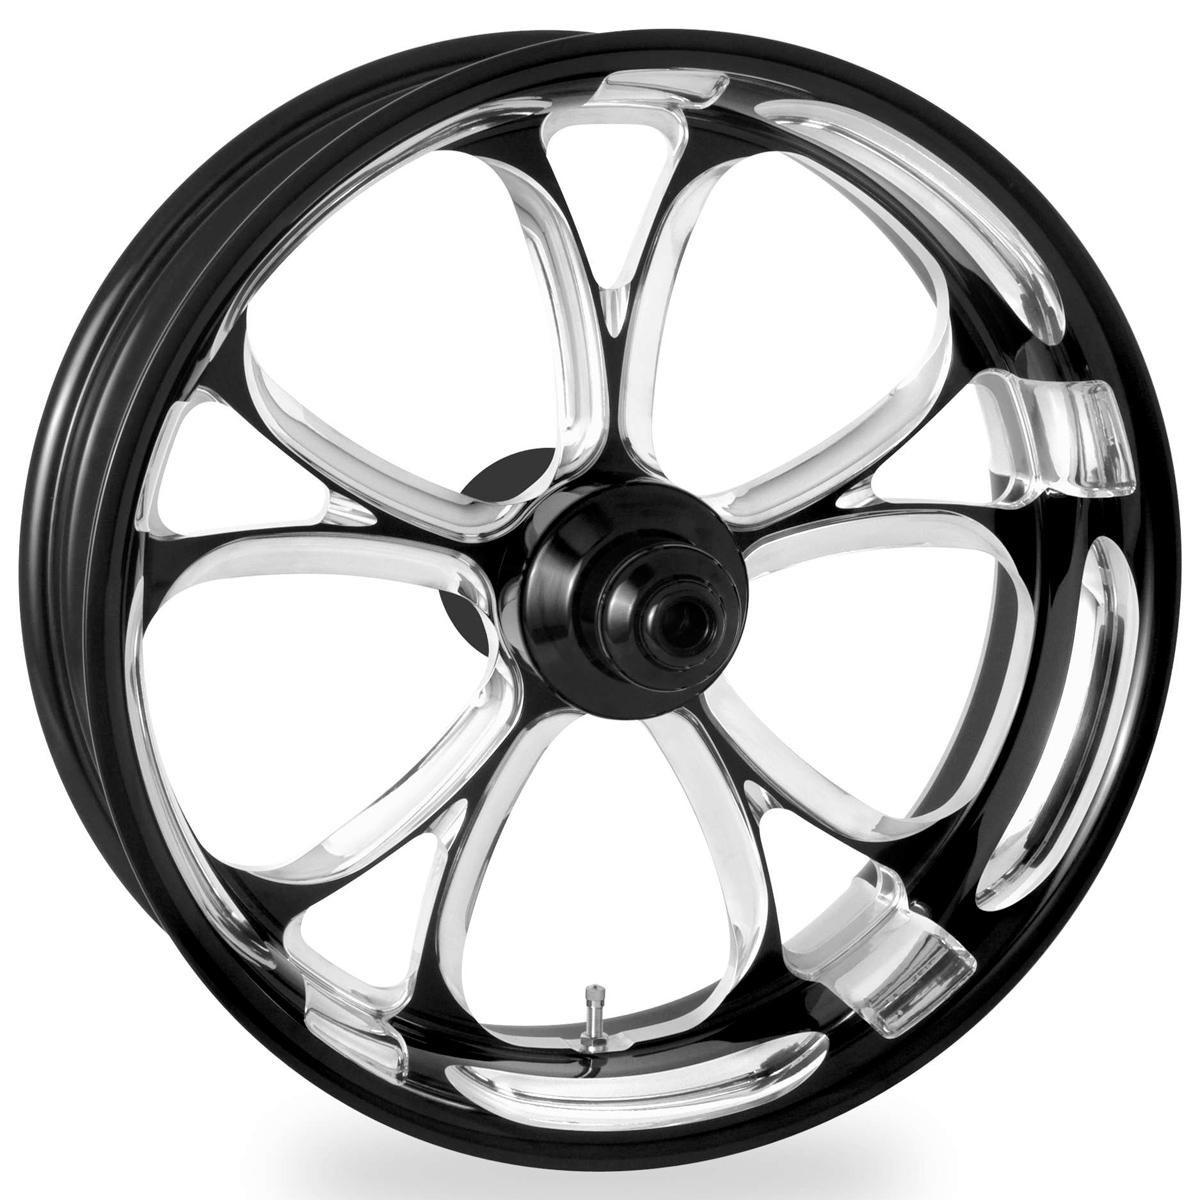 Performance Machine Luxe Platinum Cut Rear Wheel 18x3.5 Non-ABS